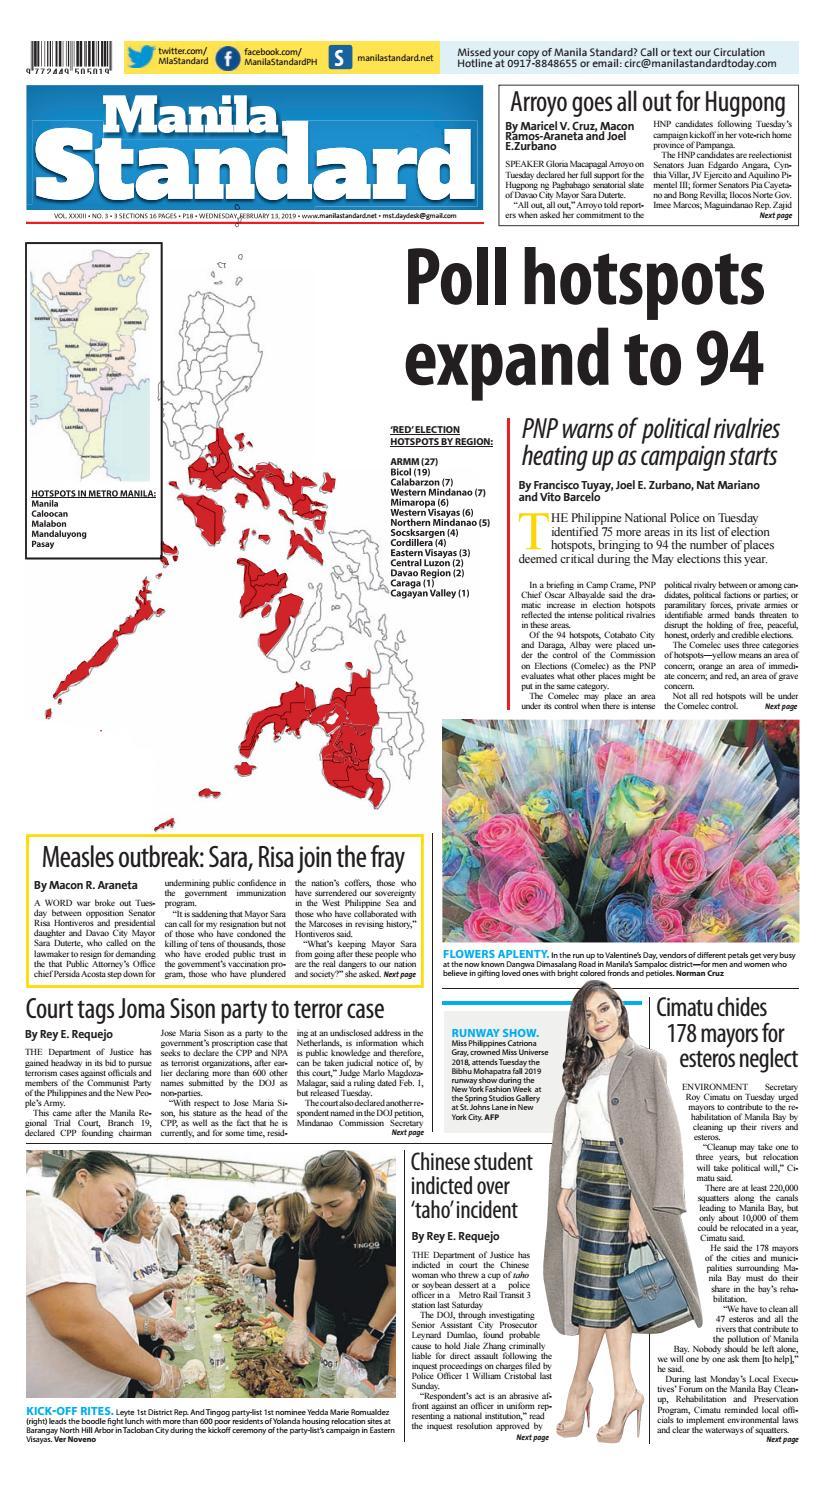 Manila Standard - 2019 February 13 - Wednesday by Manila Standard